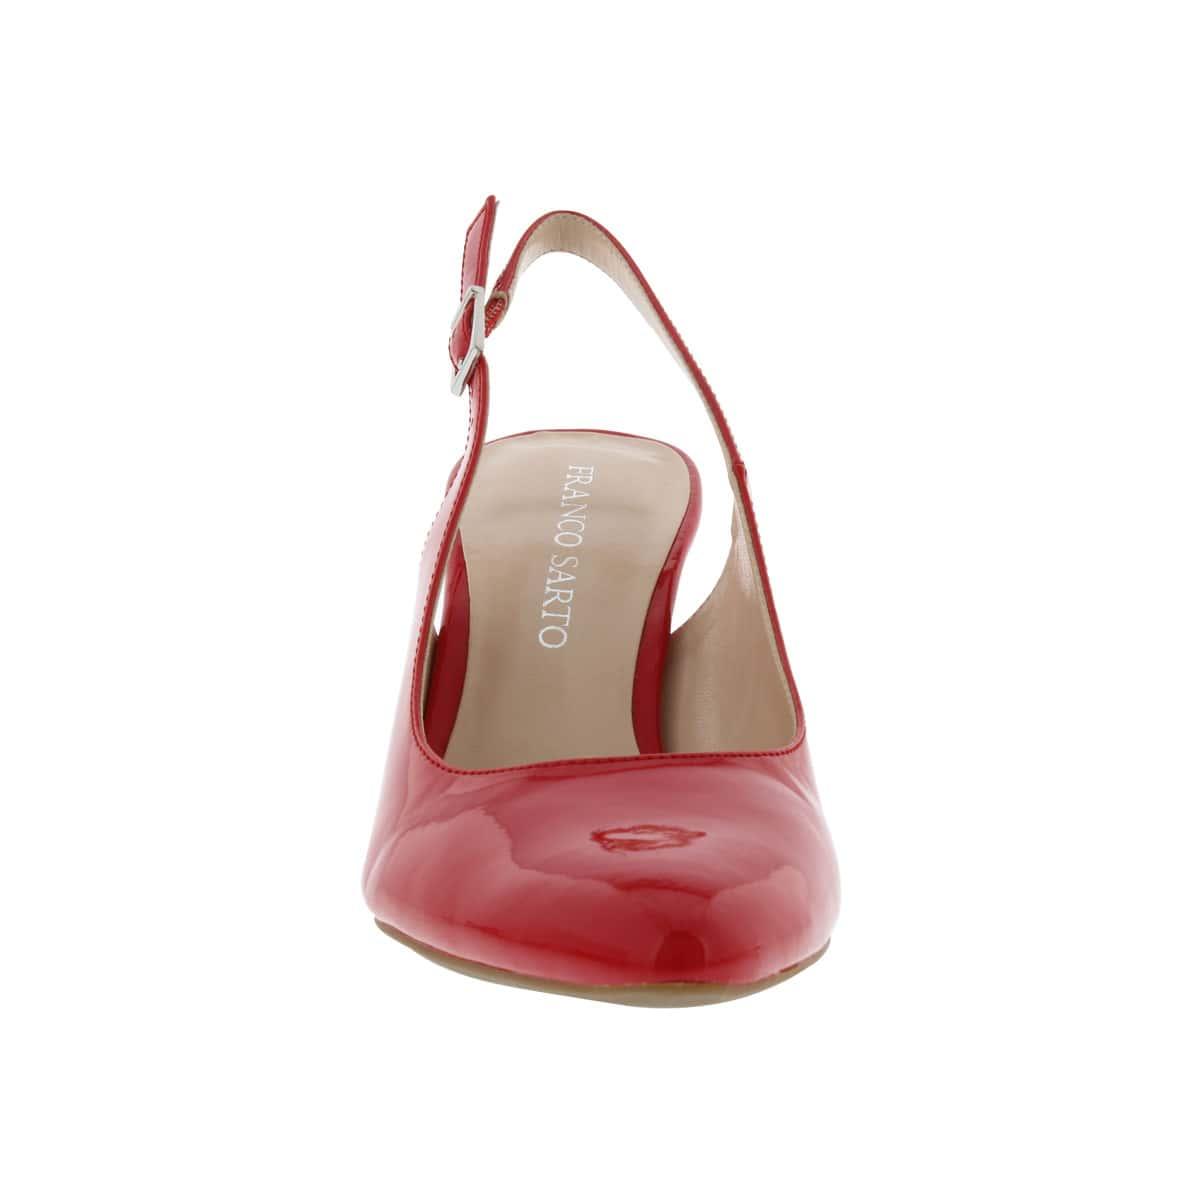 Ladies Harla red patent sling back pump